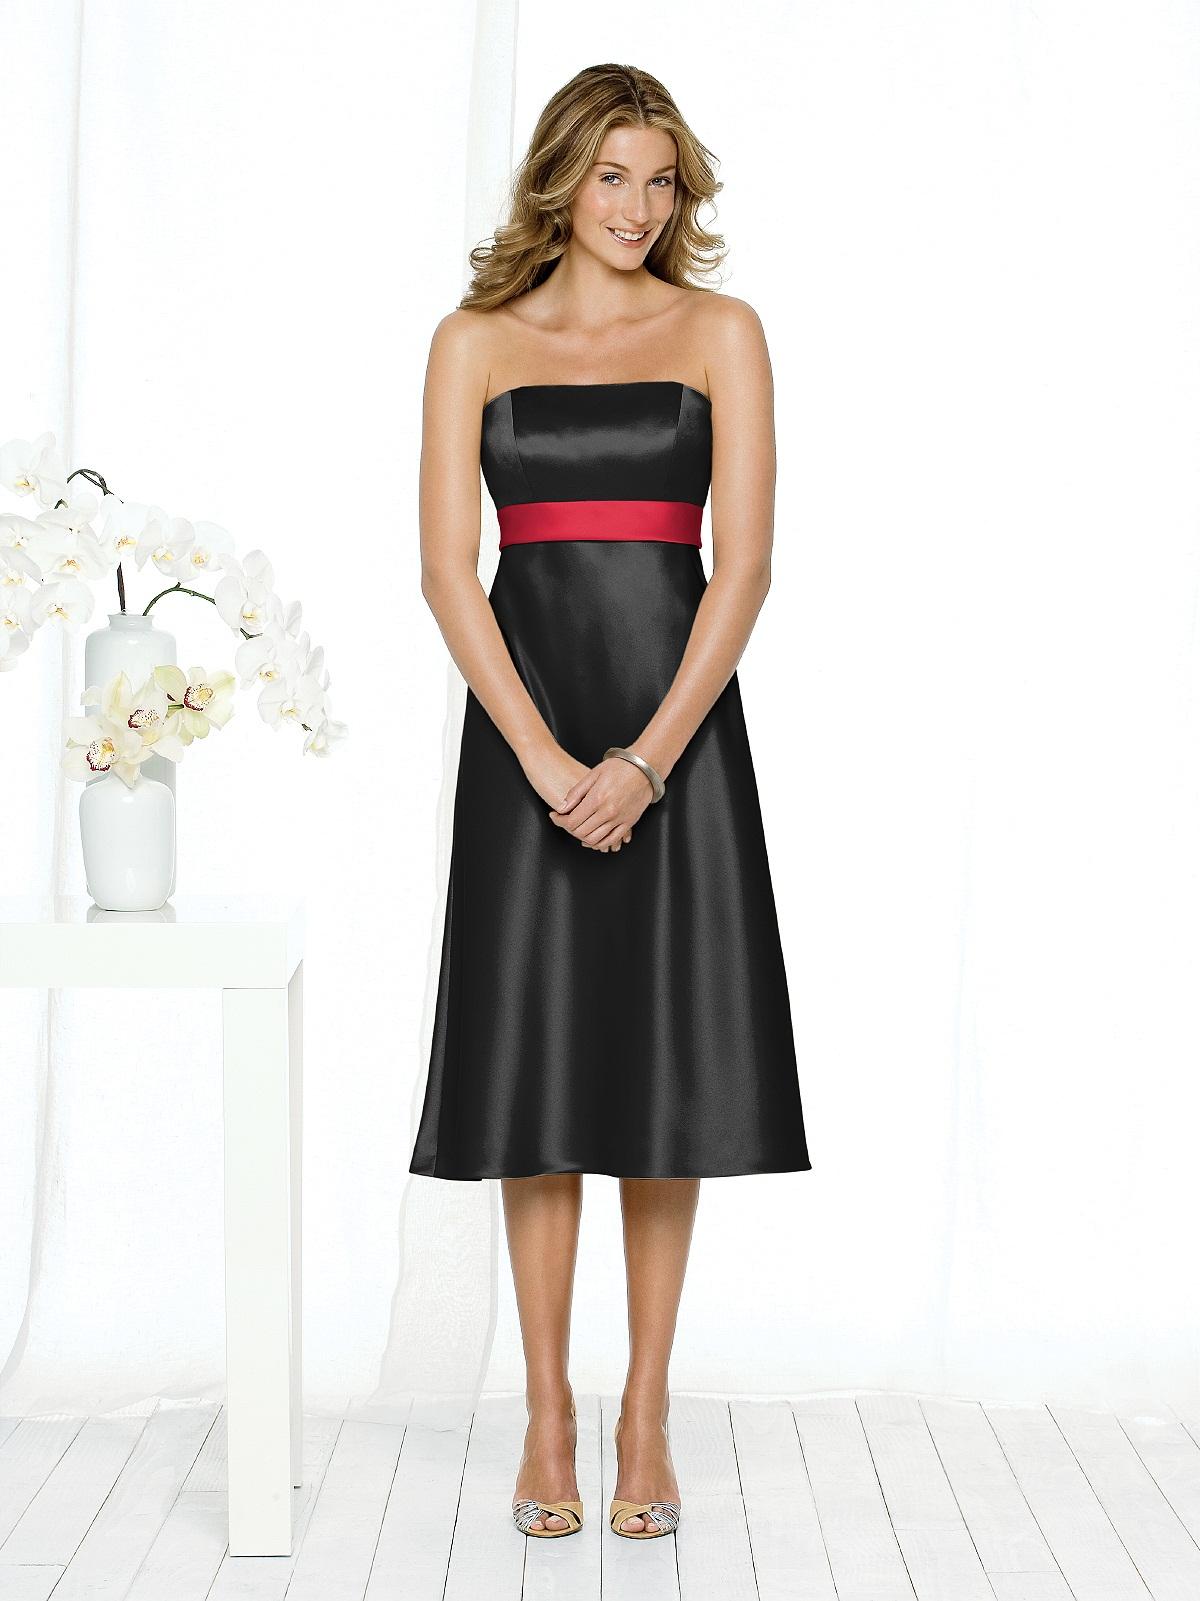 Red And Black Bridesmaid Dresses | Good Dresses